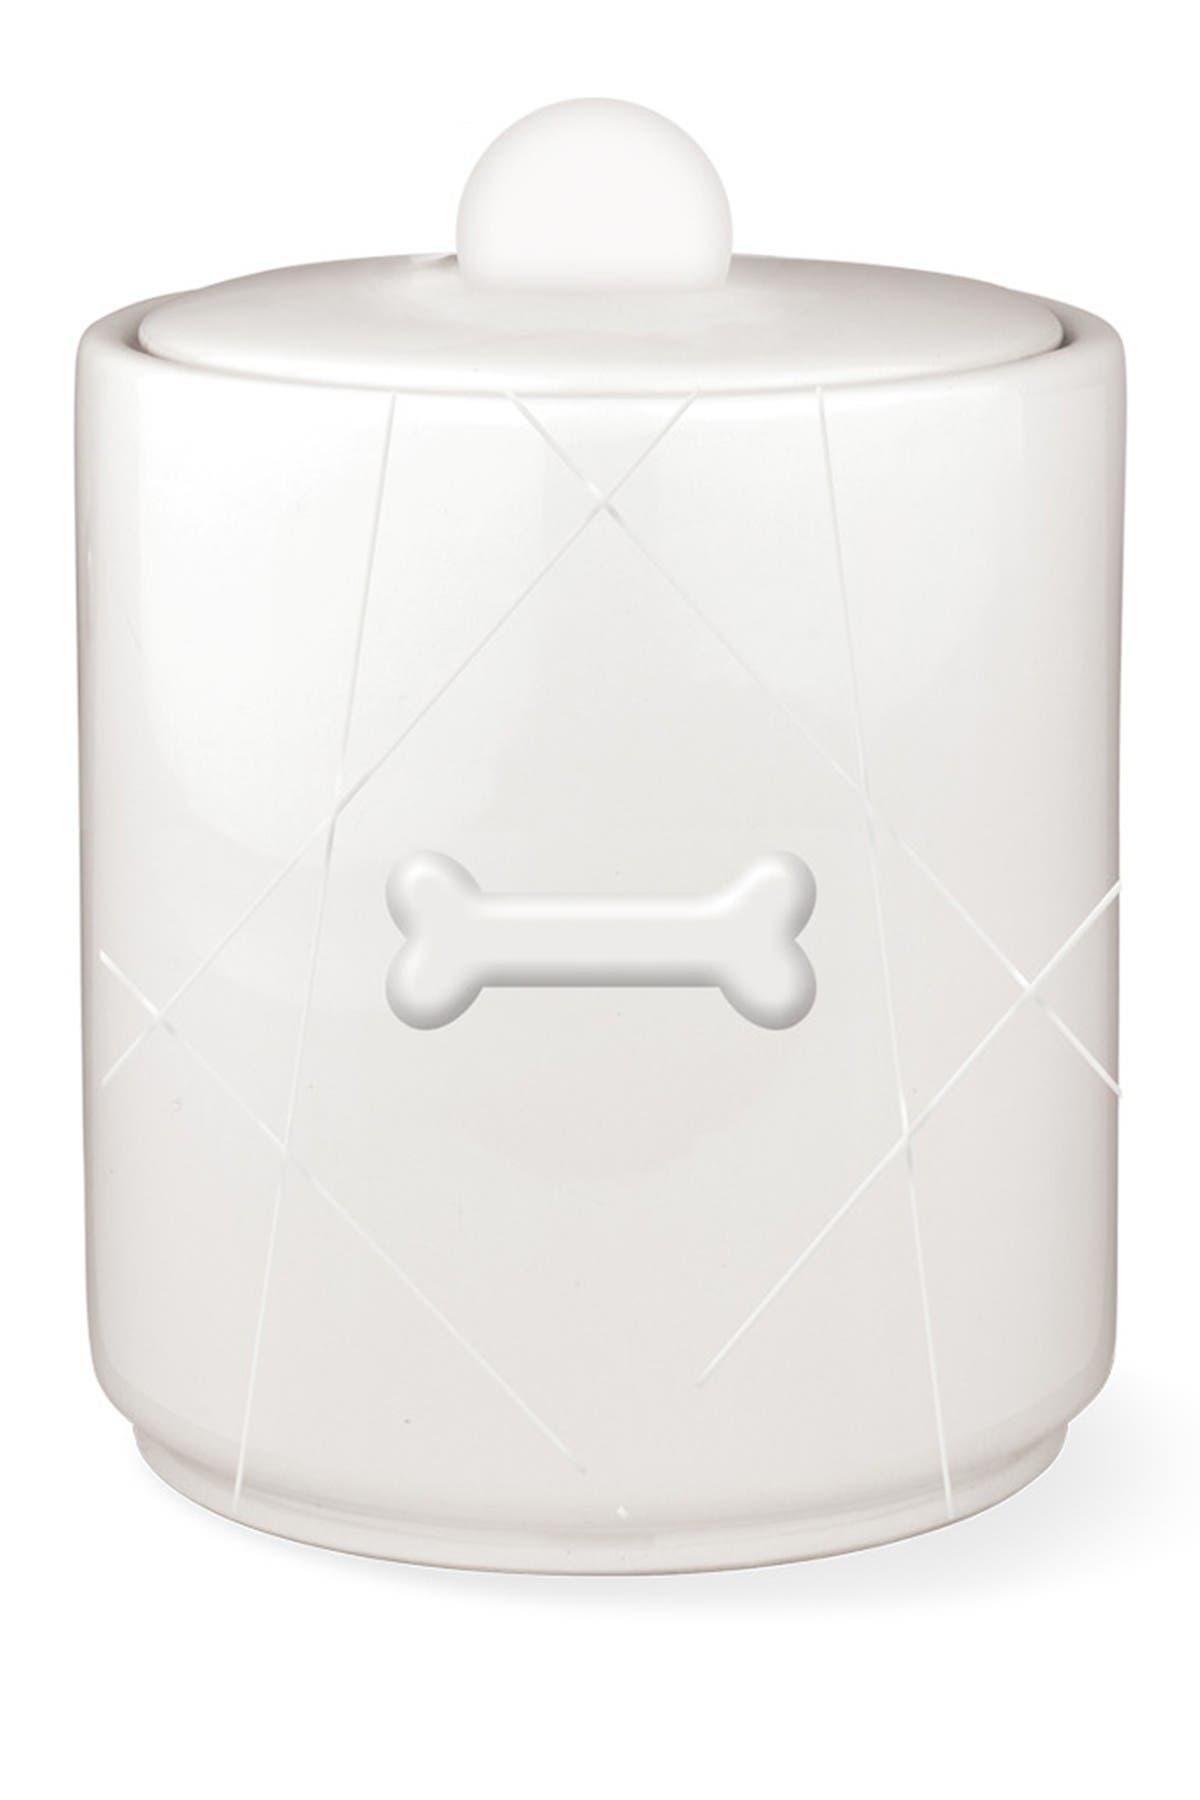 Image of Fringe Studio Geo Bone Sculpted Treat Jar